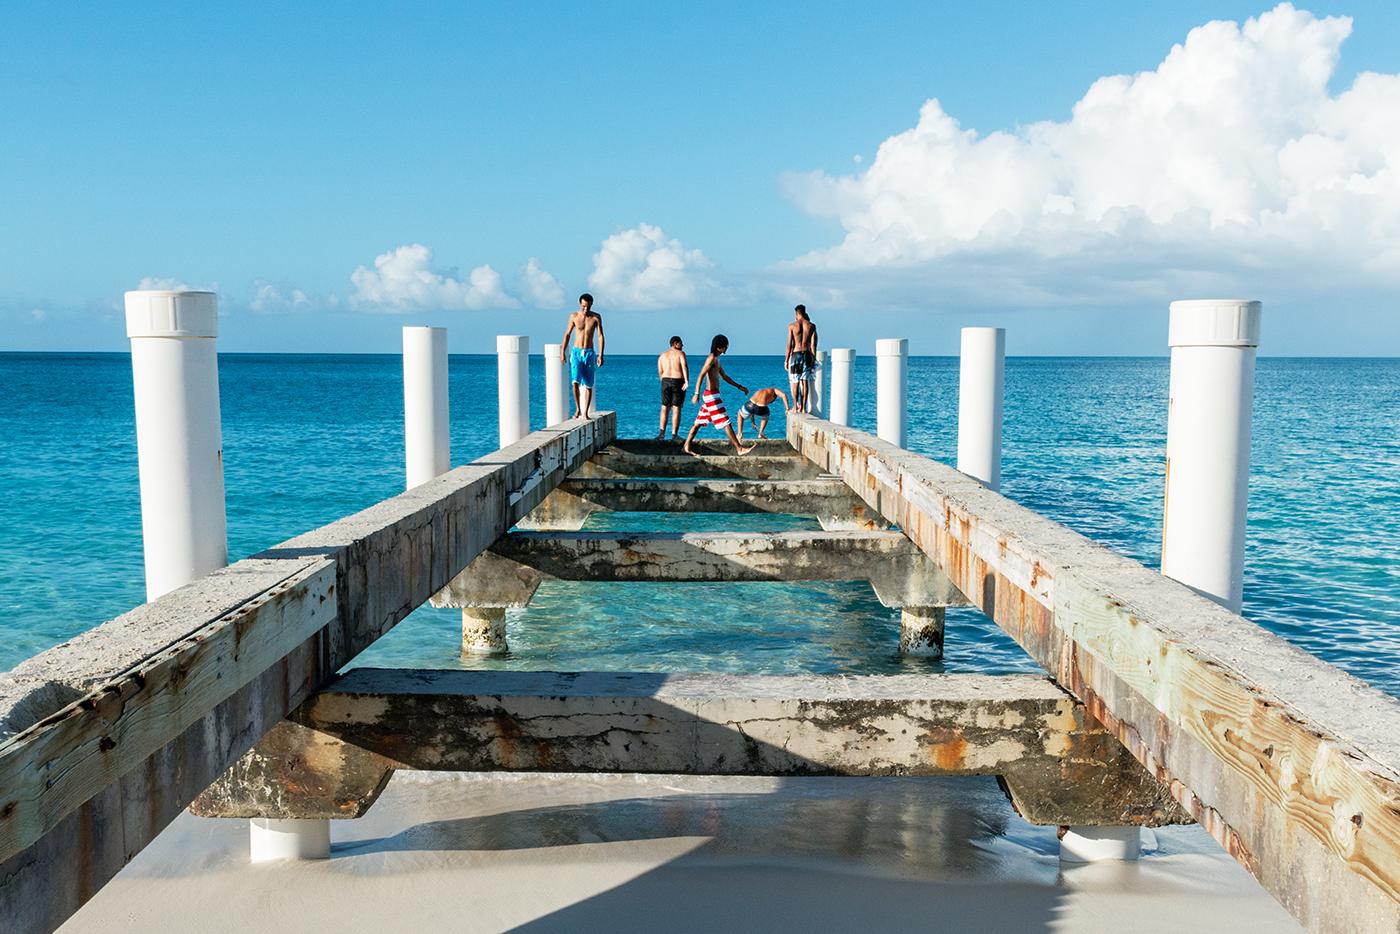 Turks and Caicos Travel Guide Pier